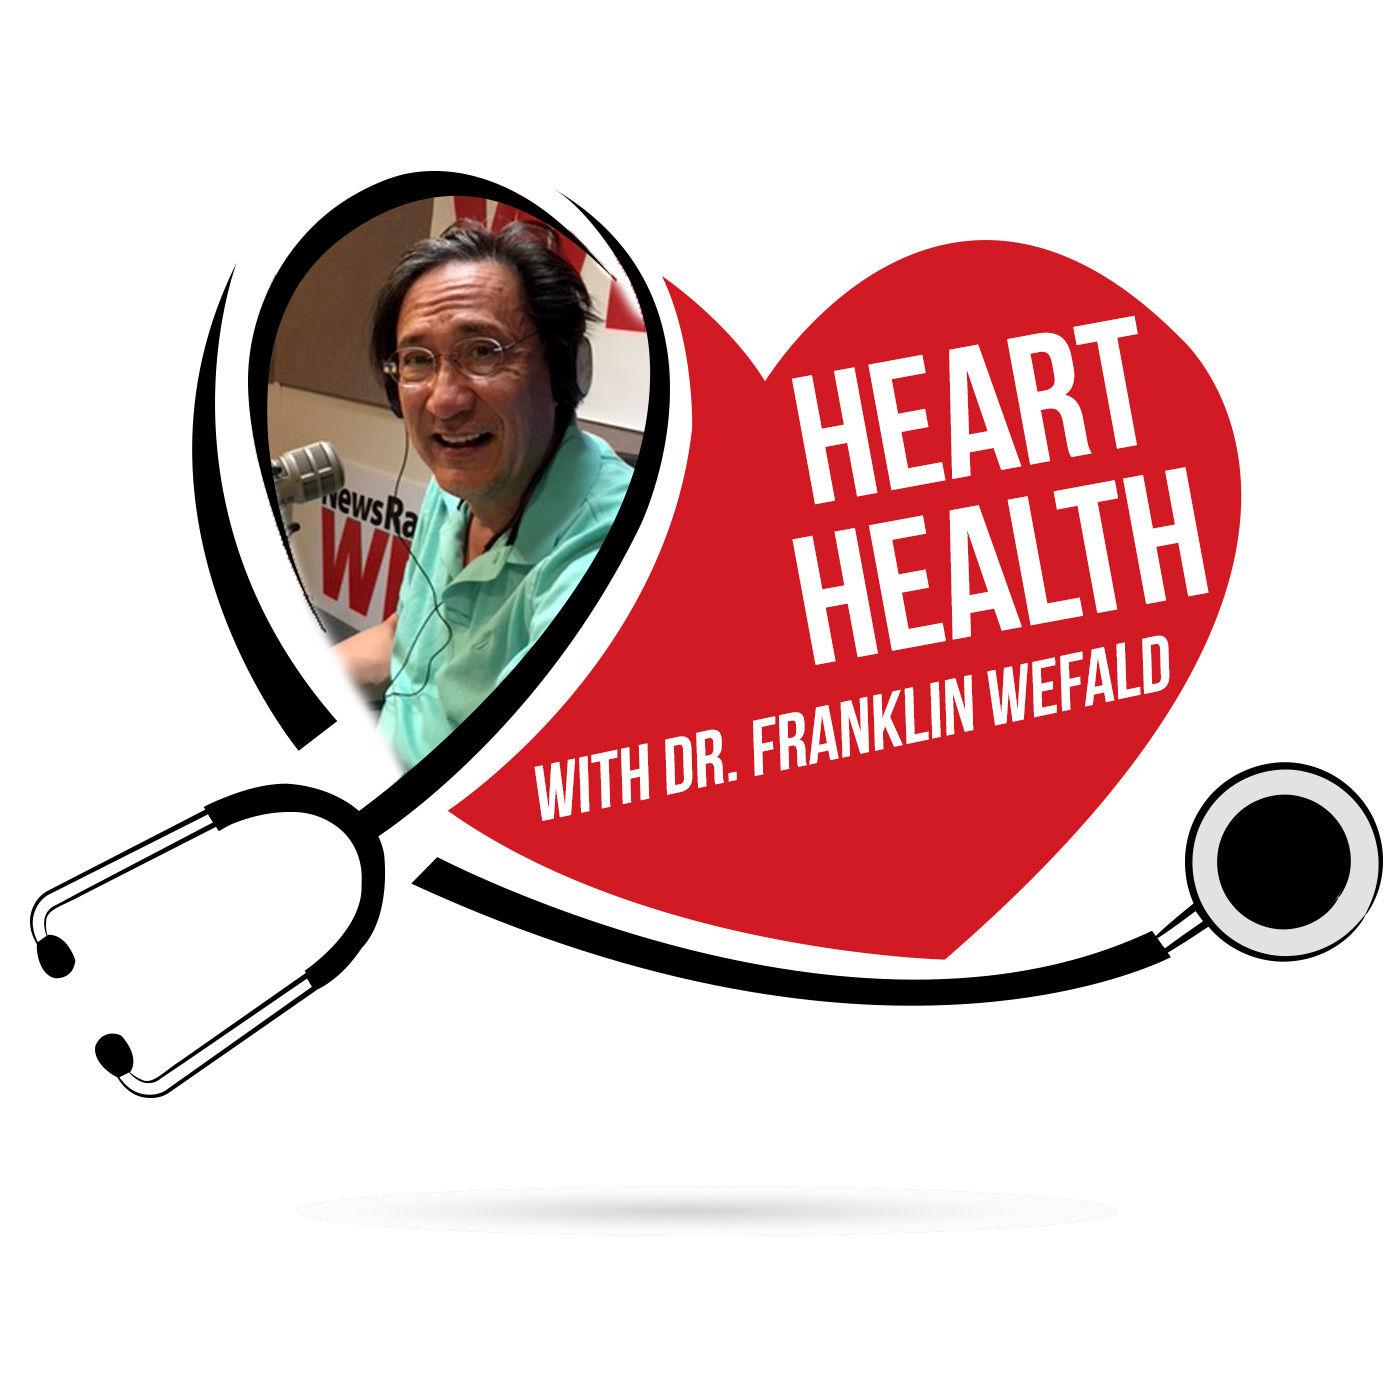 Heart Health